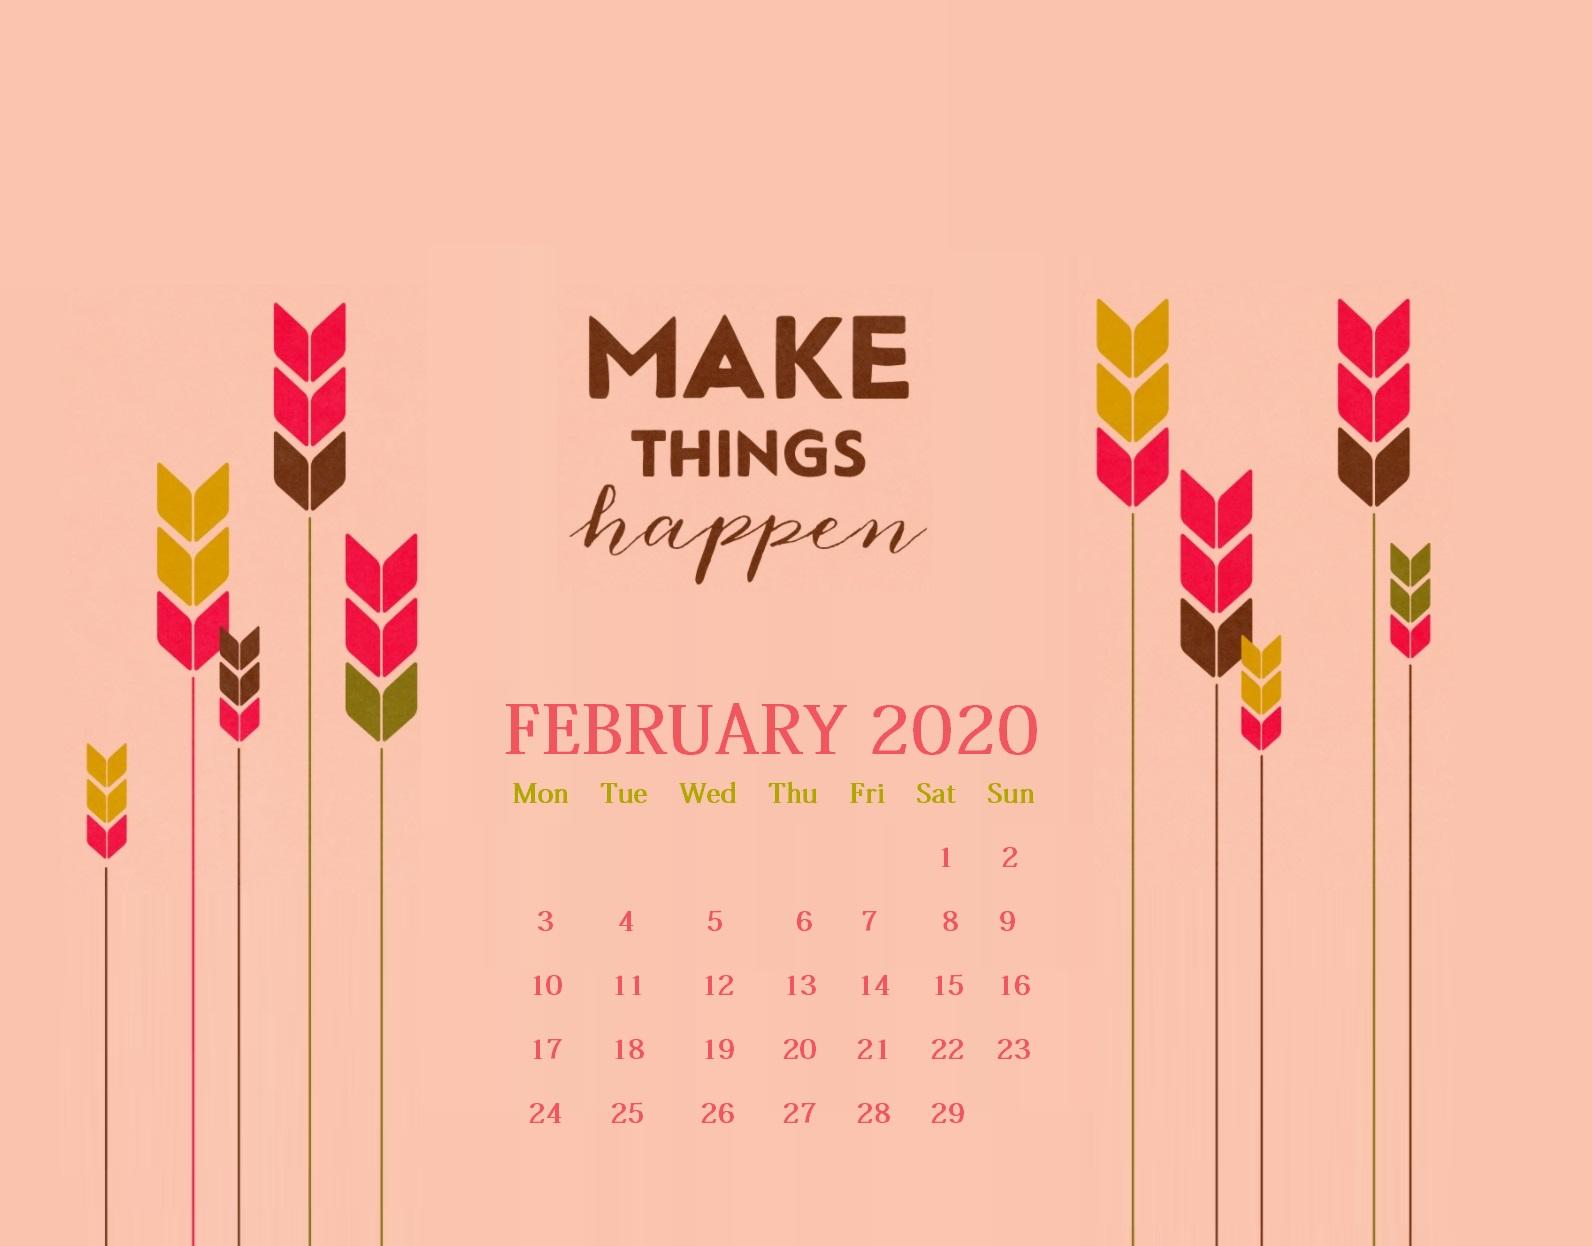 Latest February 2020 Desktop Calendar Wallpaper